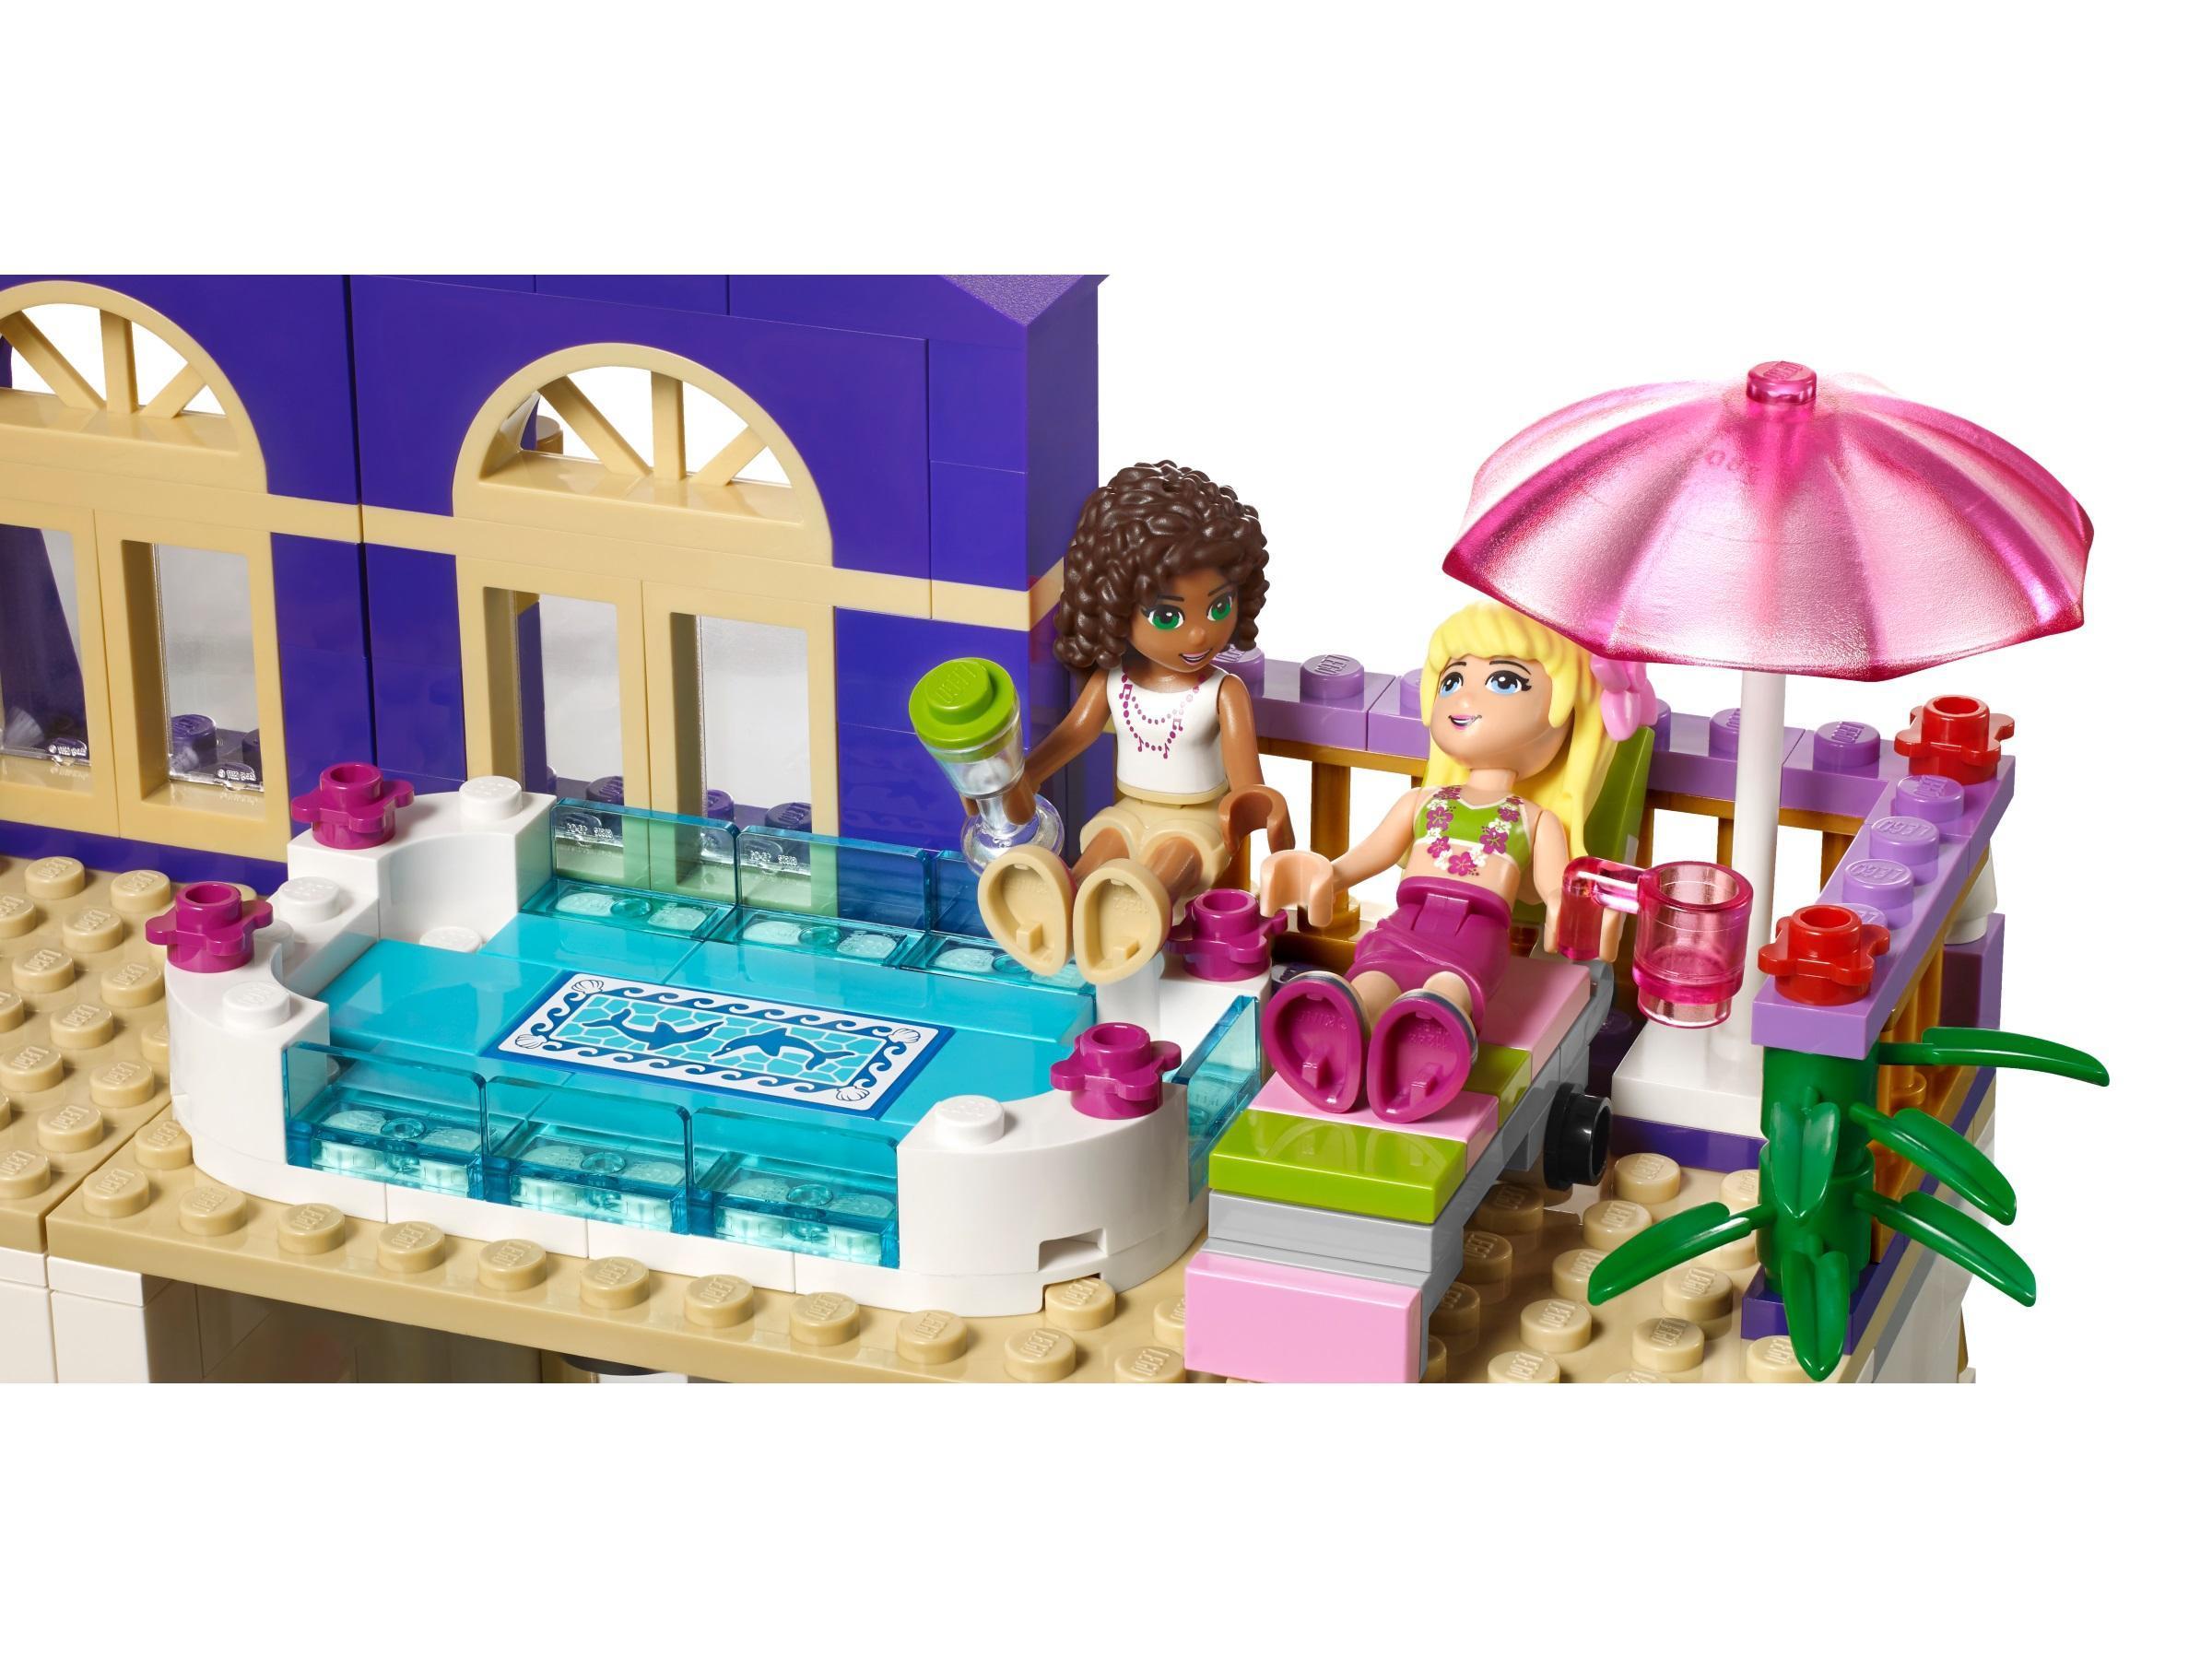 LEGO 41101 Friends Heartlake Grand Hotel: Amazon.co.uk ...